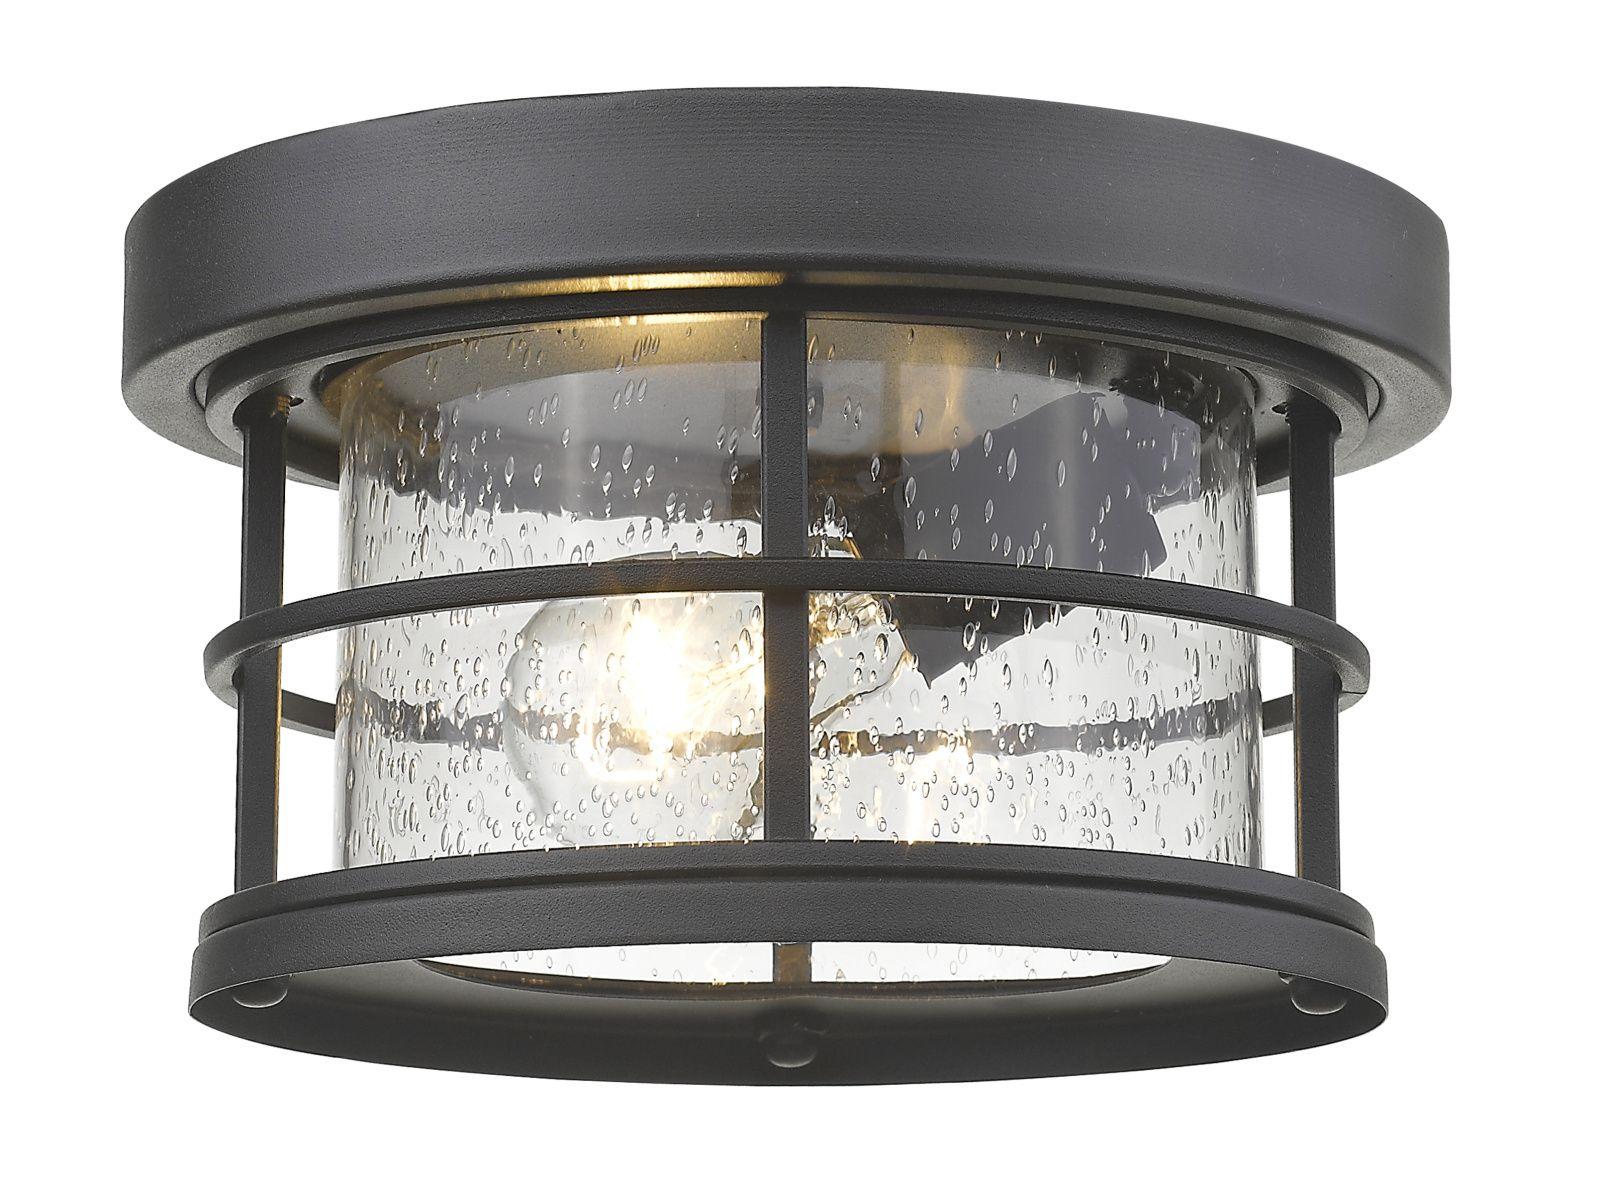 Exterior Additions Outdoor Ceiling Flush Light By Z Lite 555f Bk Outdoor Light Fixtures Outdoor Ceiling Lights Glass Ceiling Lights